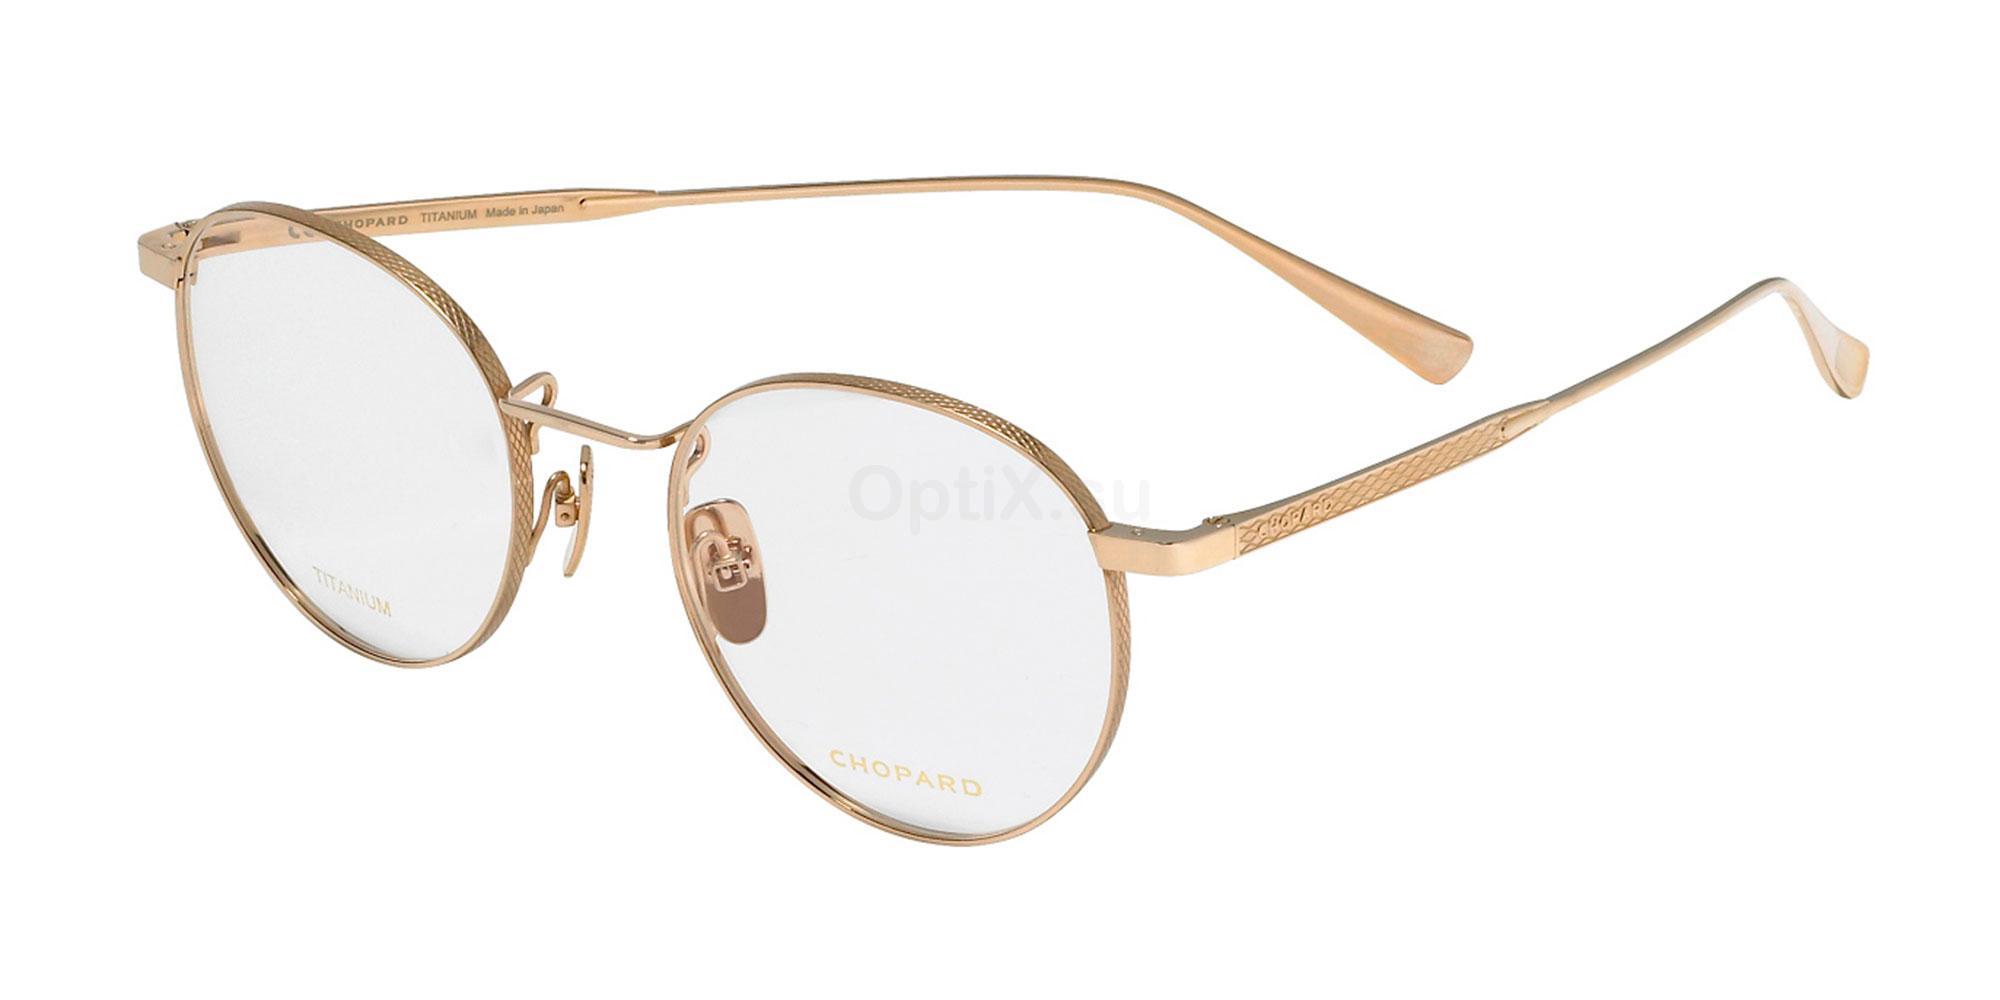 0300 VCHC77M Glasses, Chopard